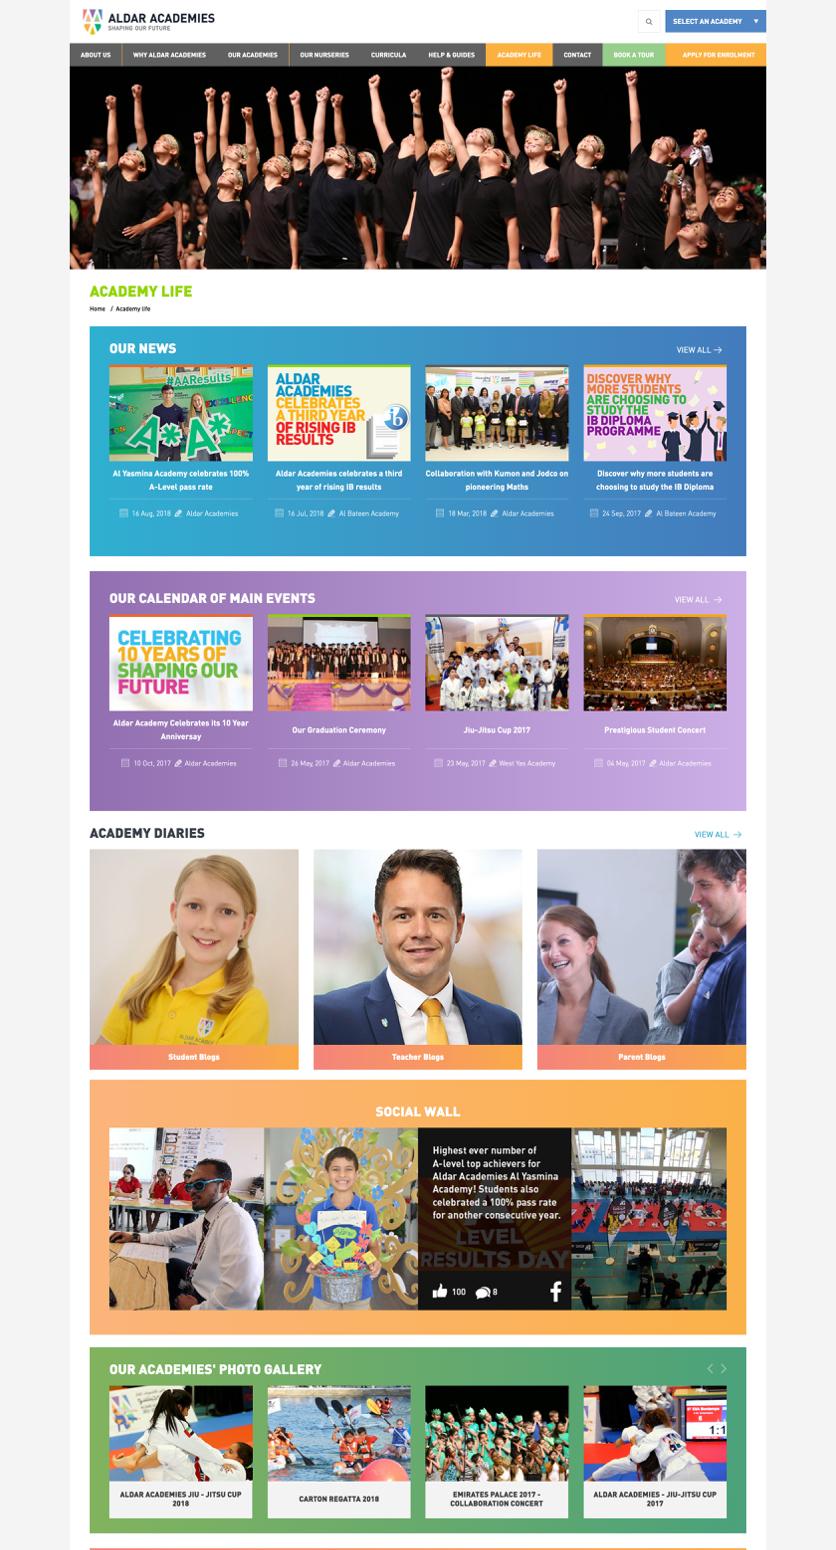 Web Image Gallery 2-Jul-11-2020-07-09-07-32-PM